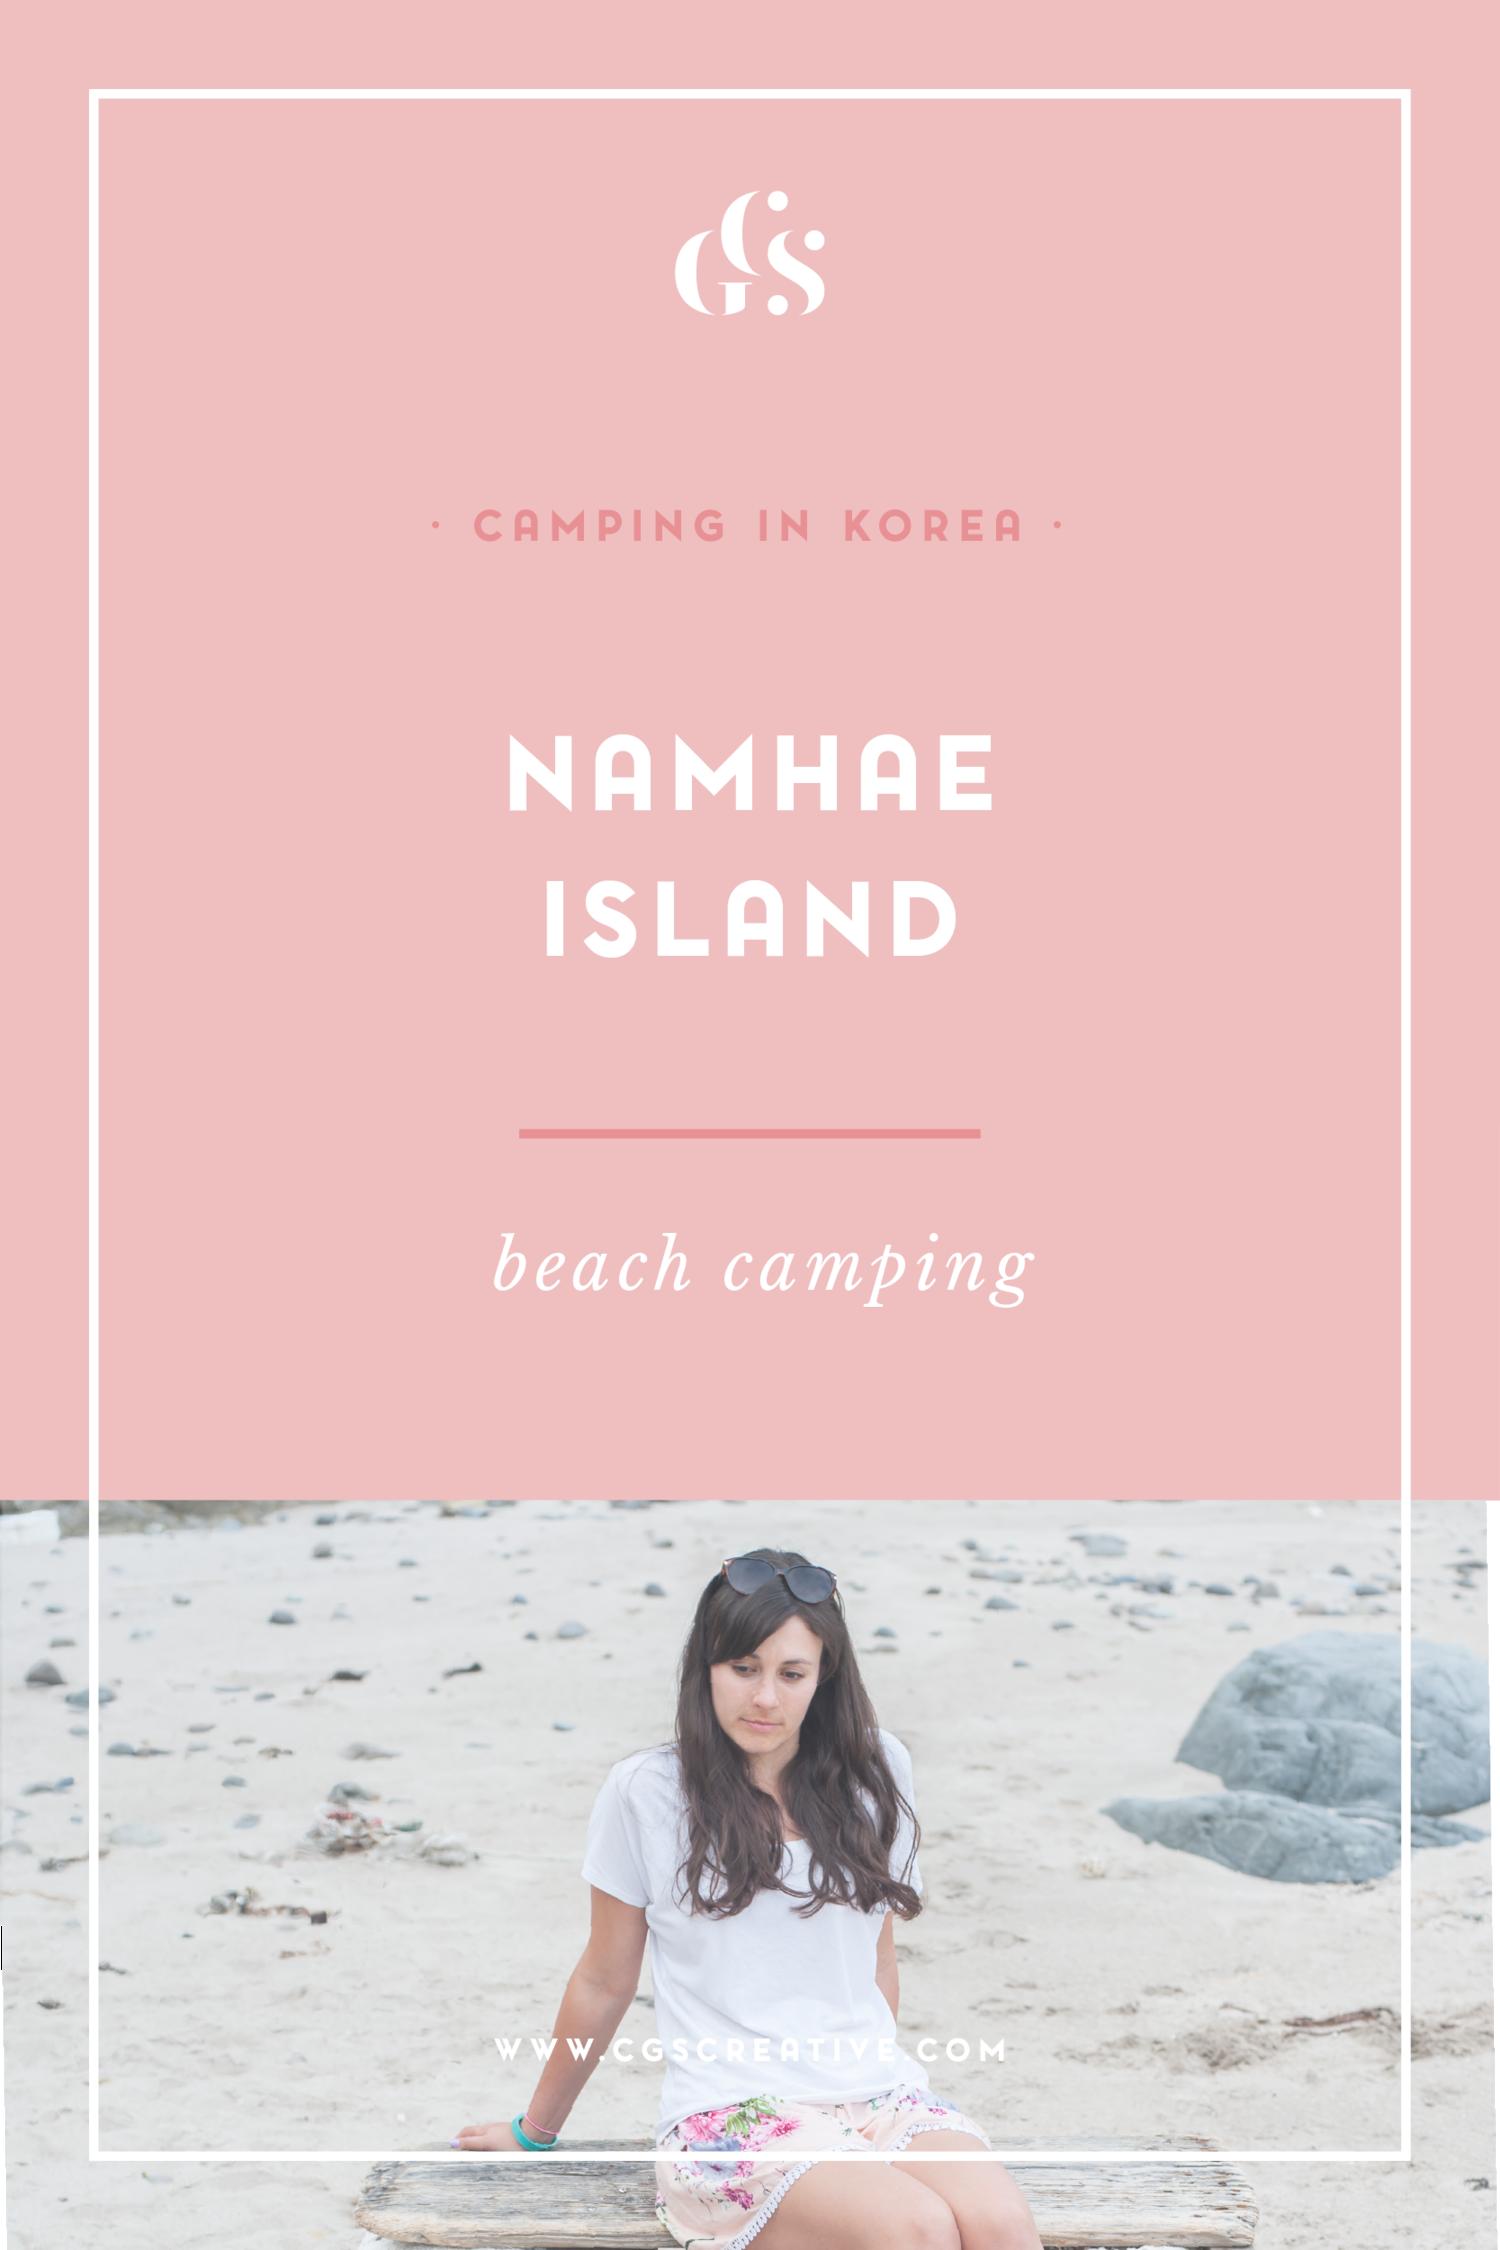 Camping In Korea Namhae Island Citygirlsearching Camping Activities For Kids Beach Camping Camping In Georgia